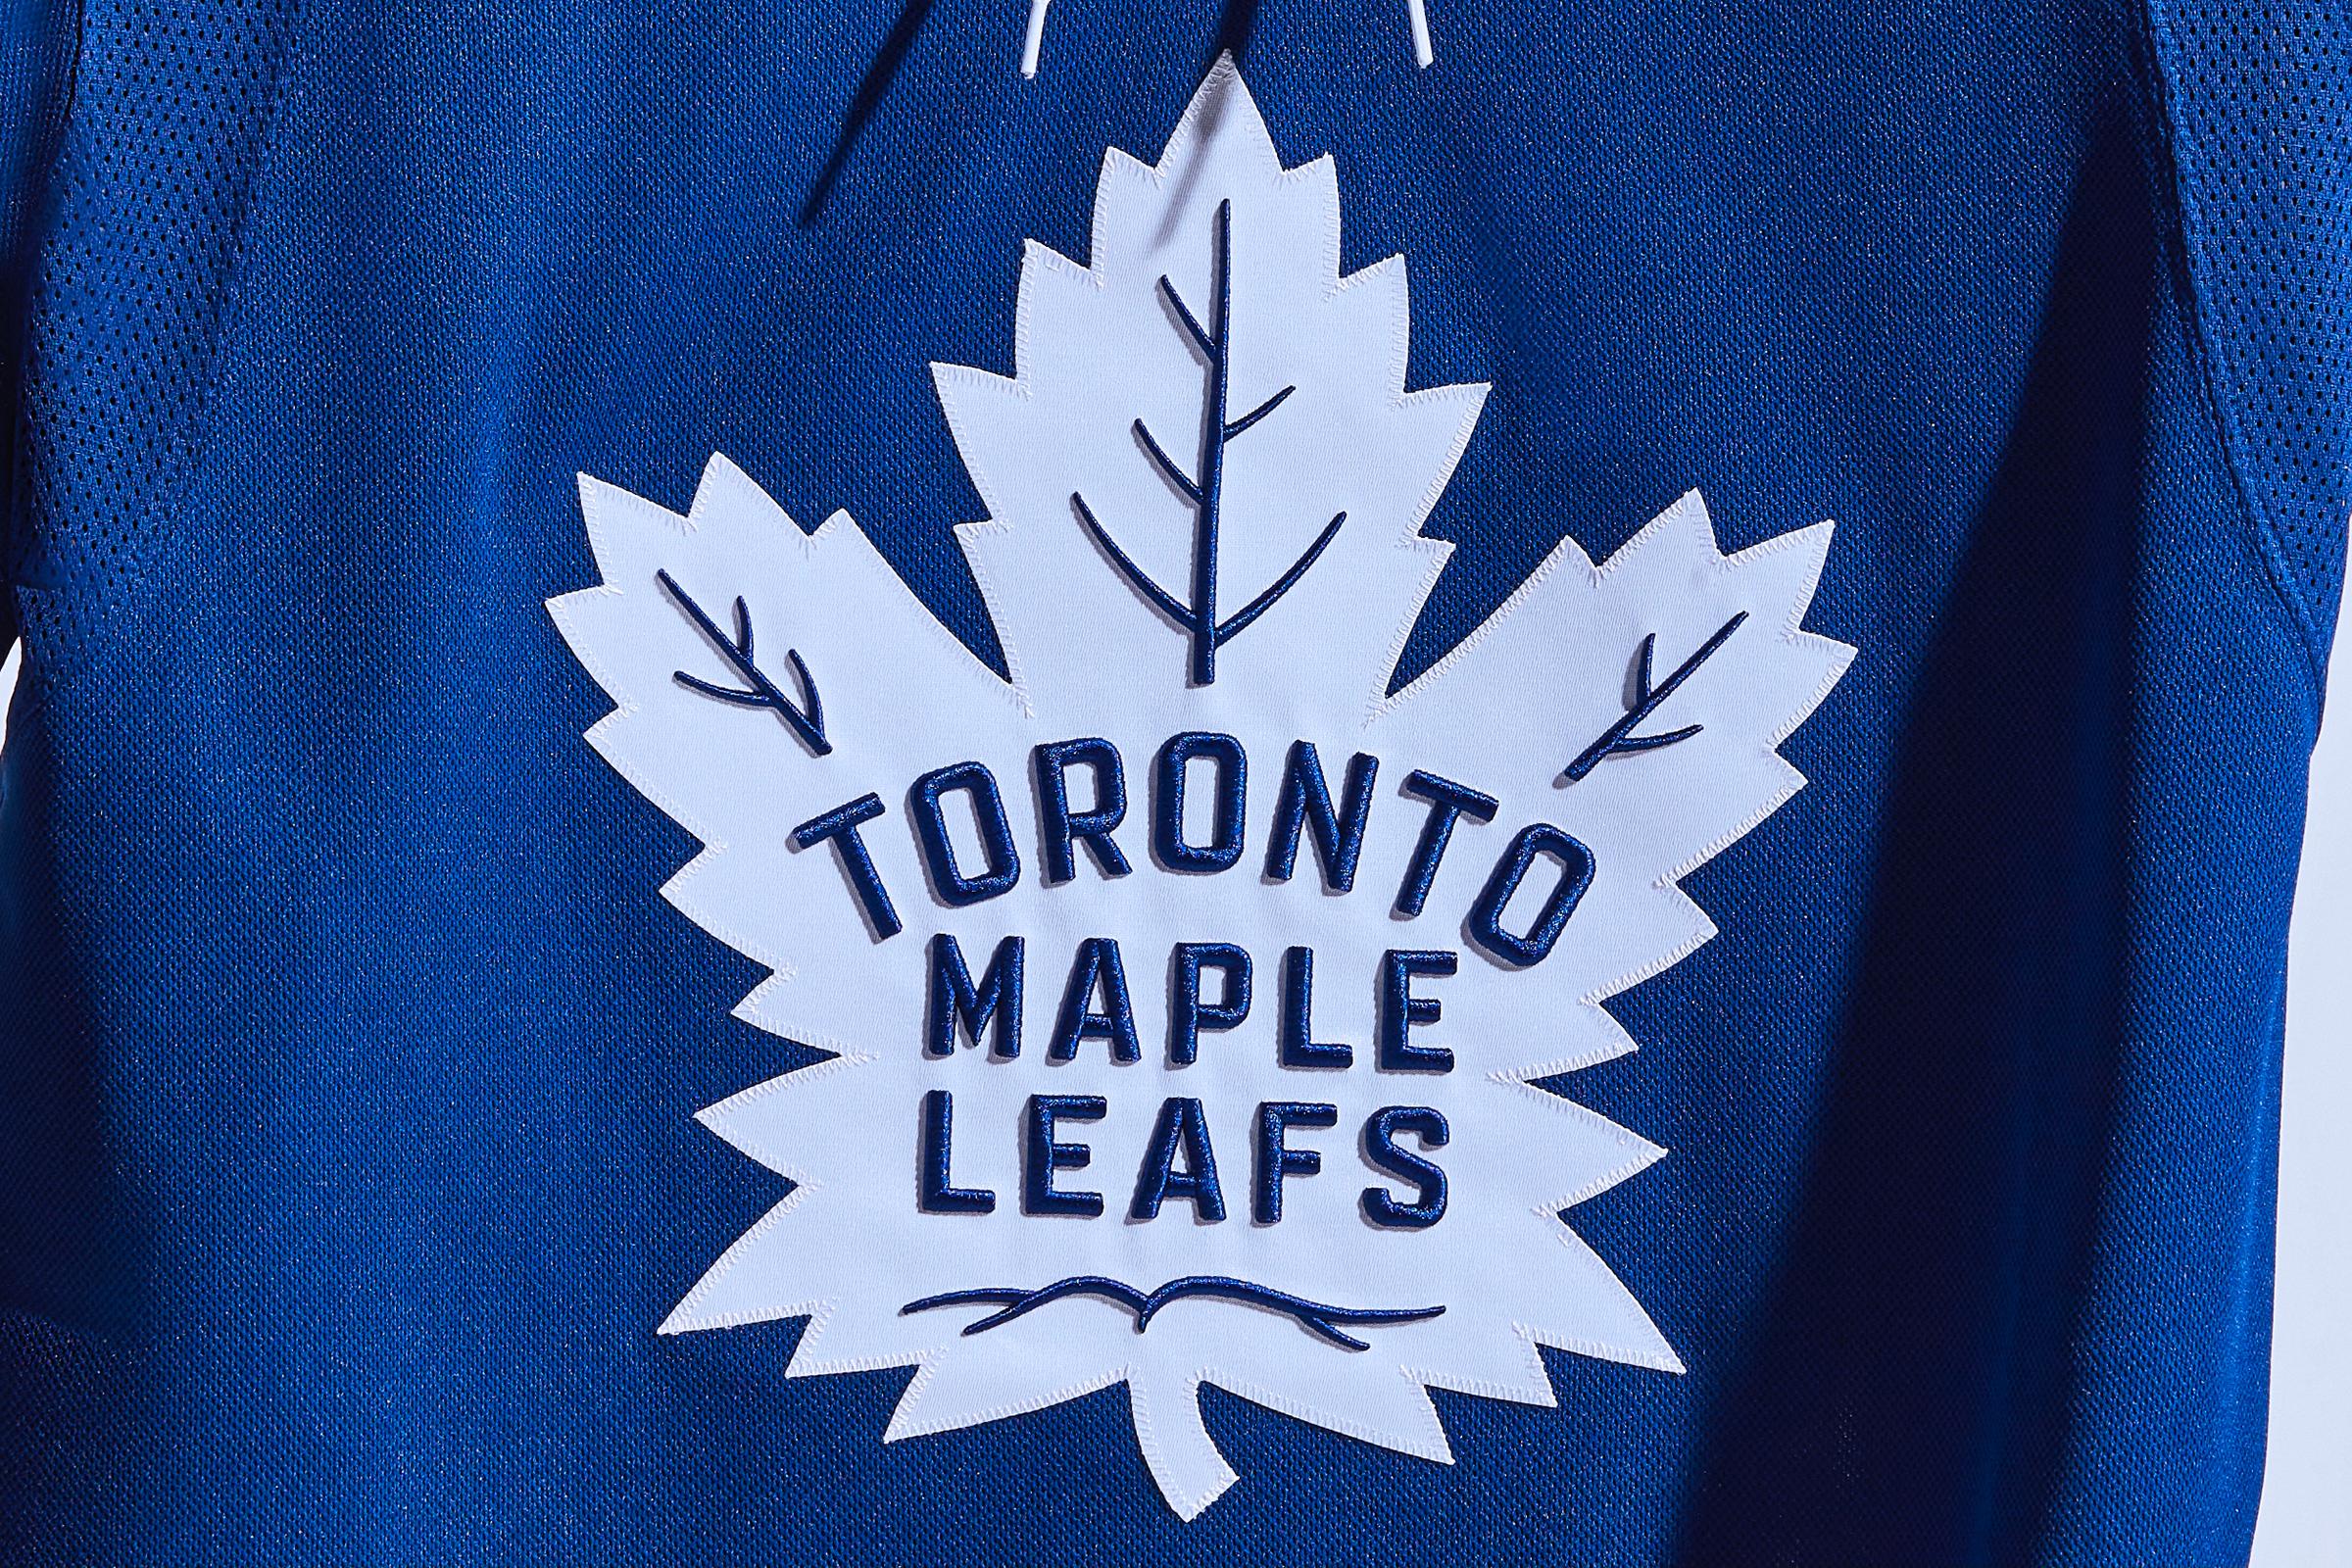 The Mapleleafs' new uniform.